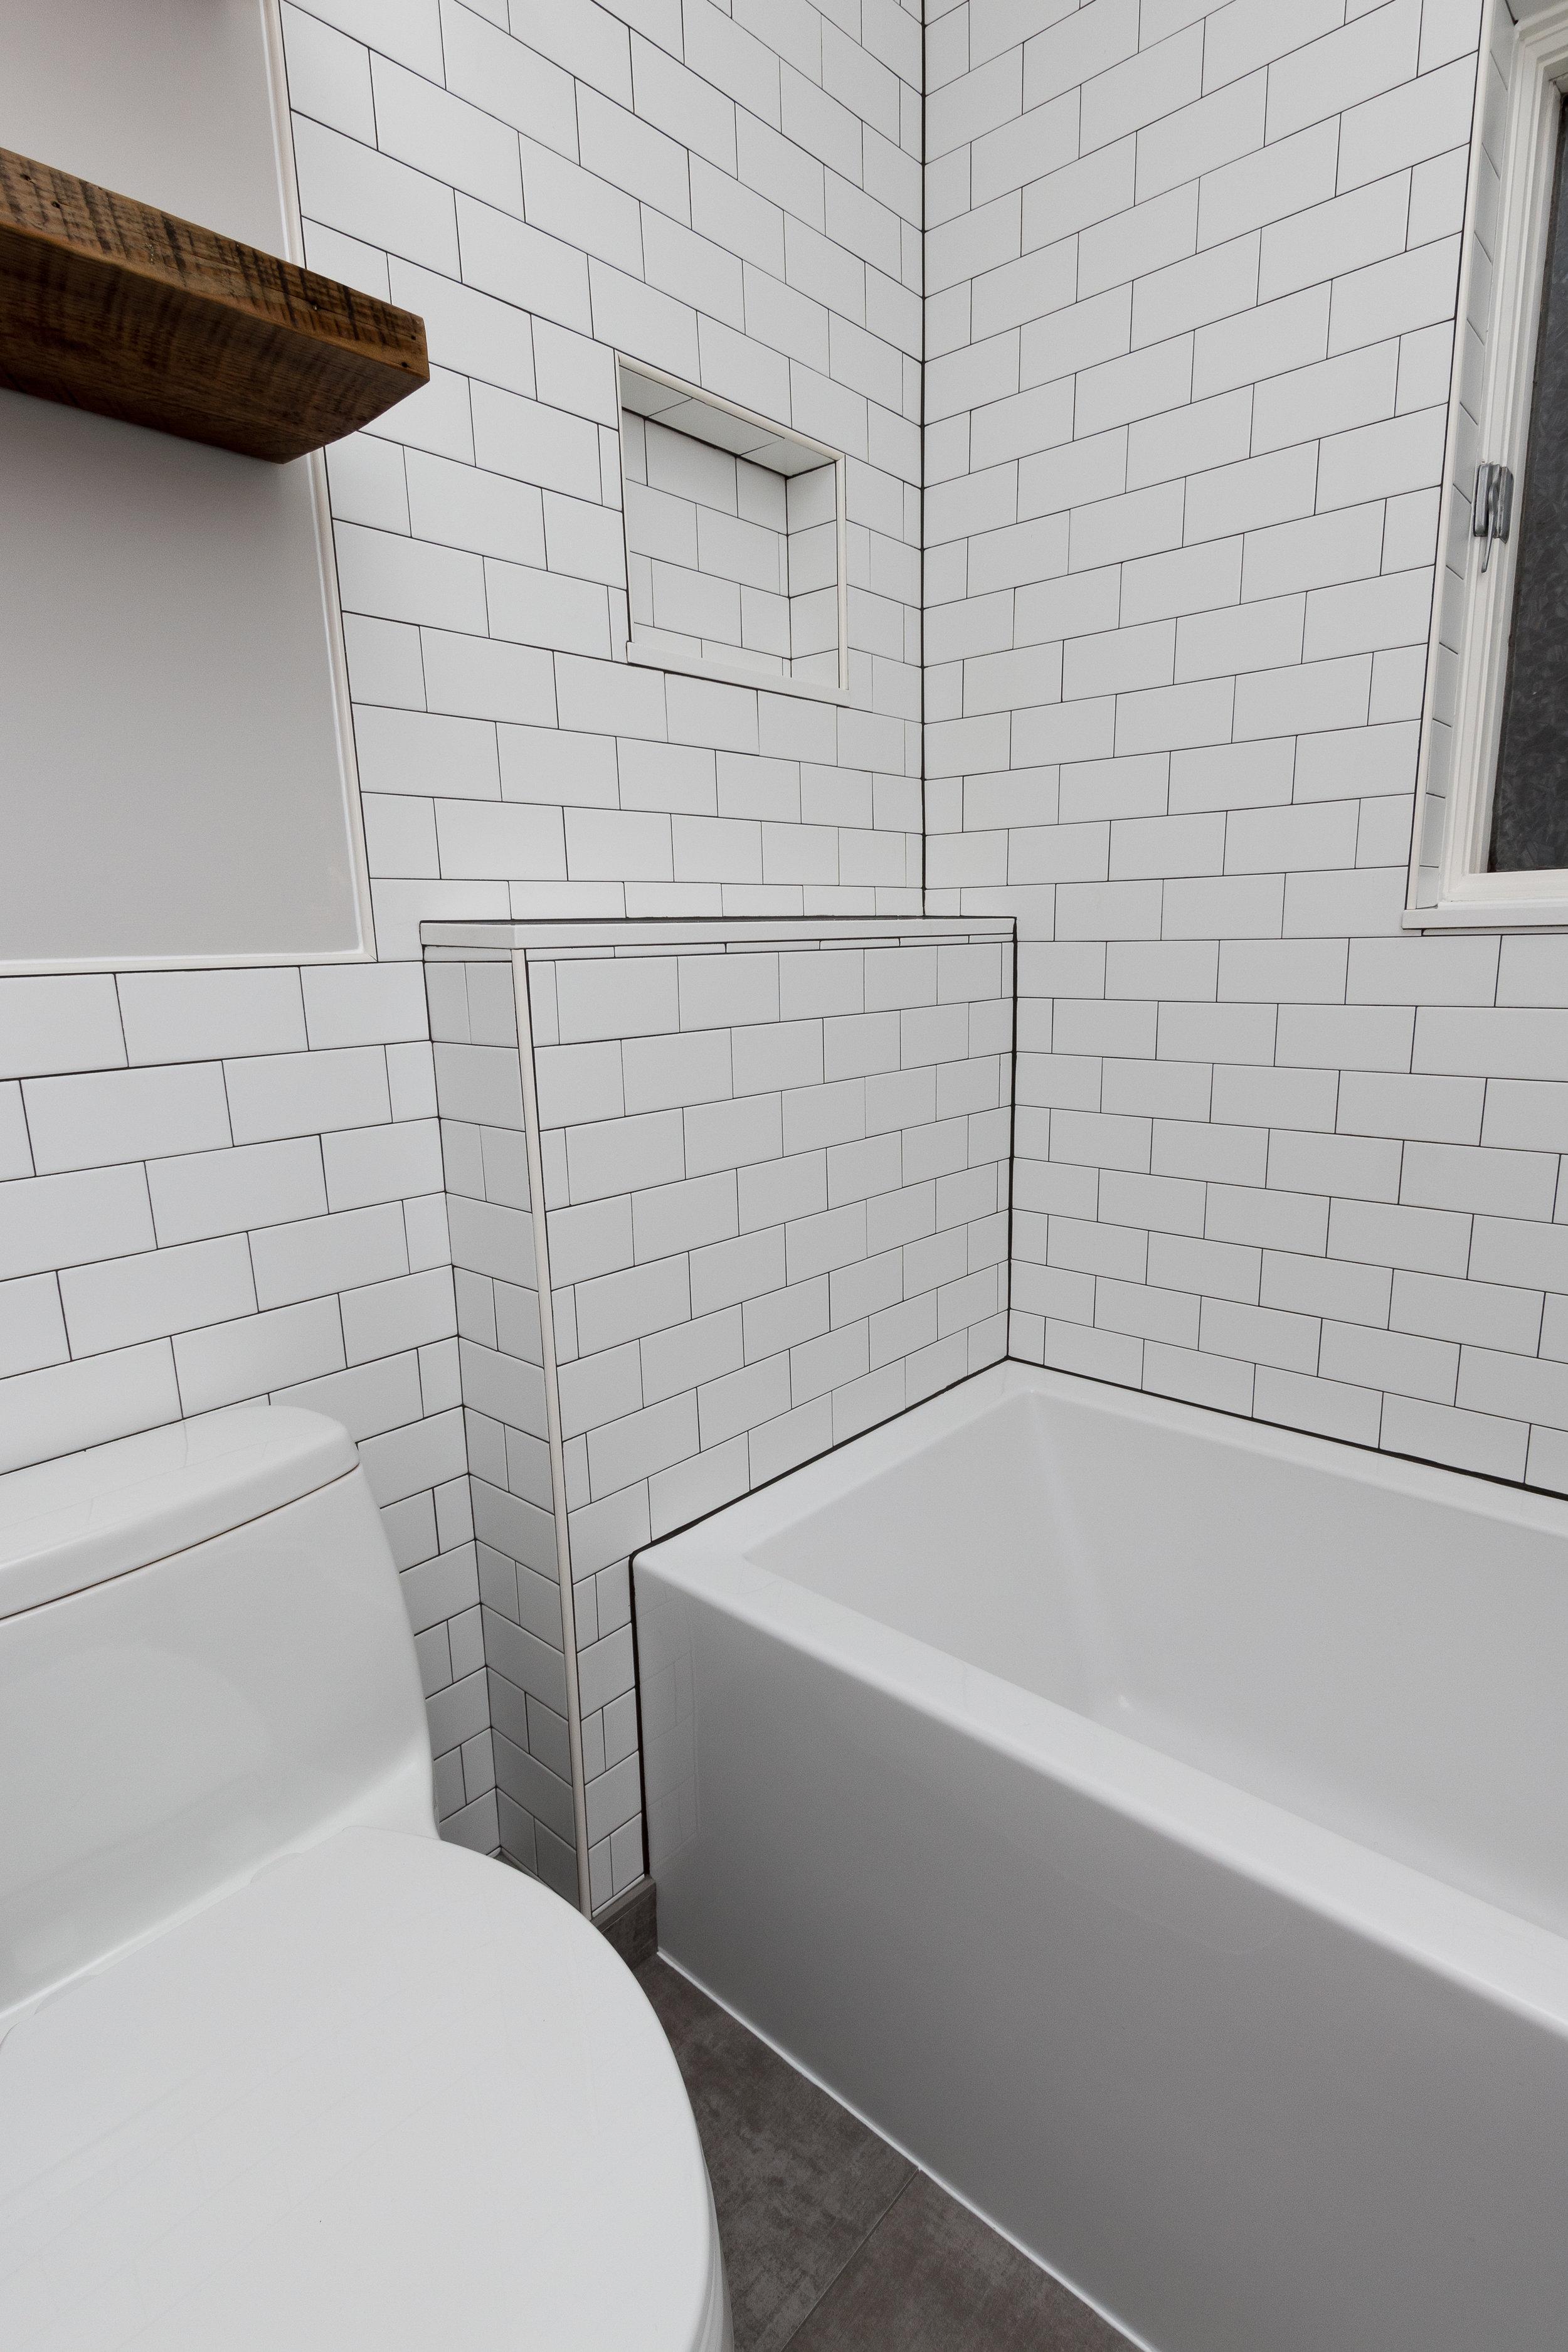 niche shelf and tub from angle.jpg